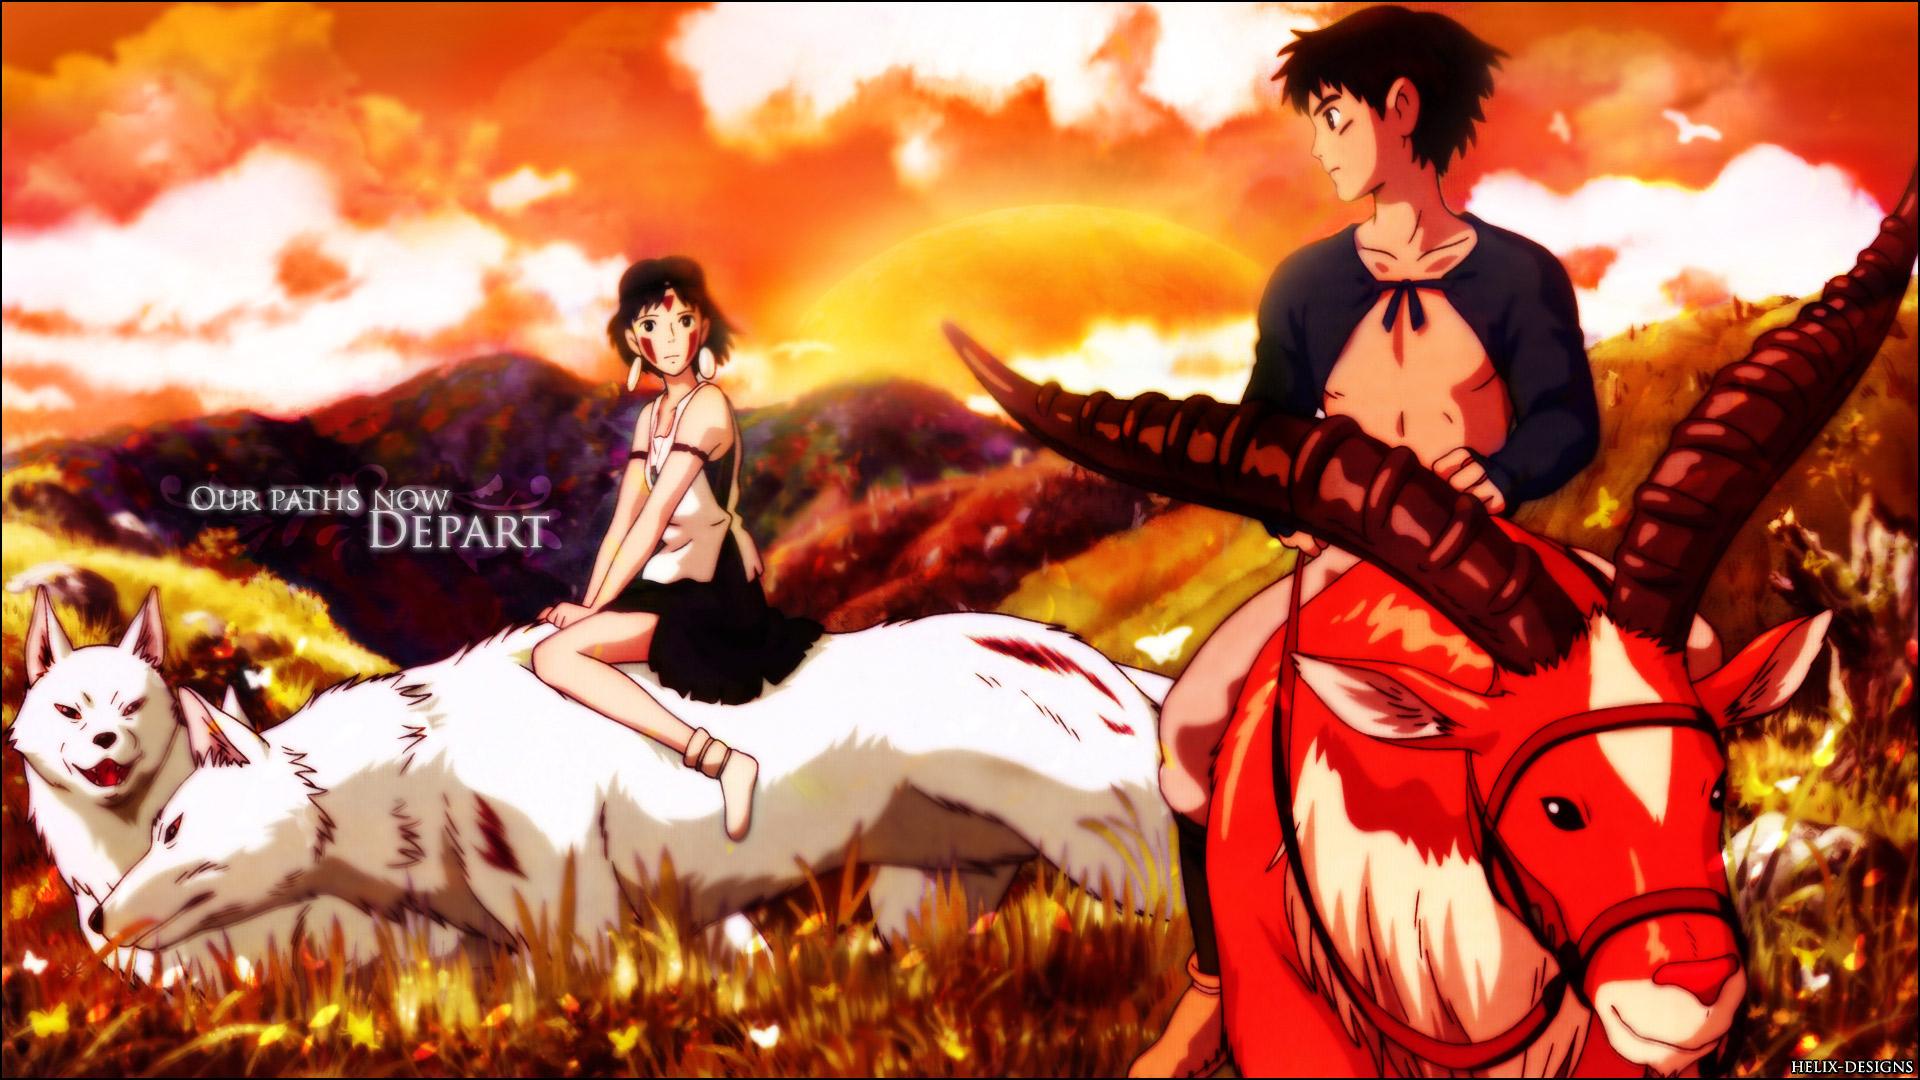 Princess Mononoke Ashitaka Wolves San Princess Mononoke Free Wallpaper Wallpaperjam Com